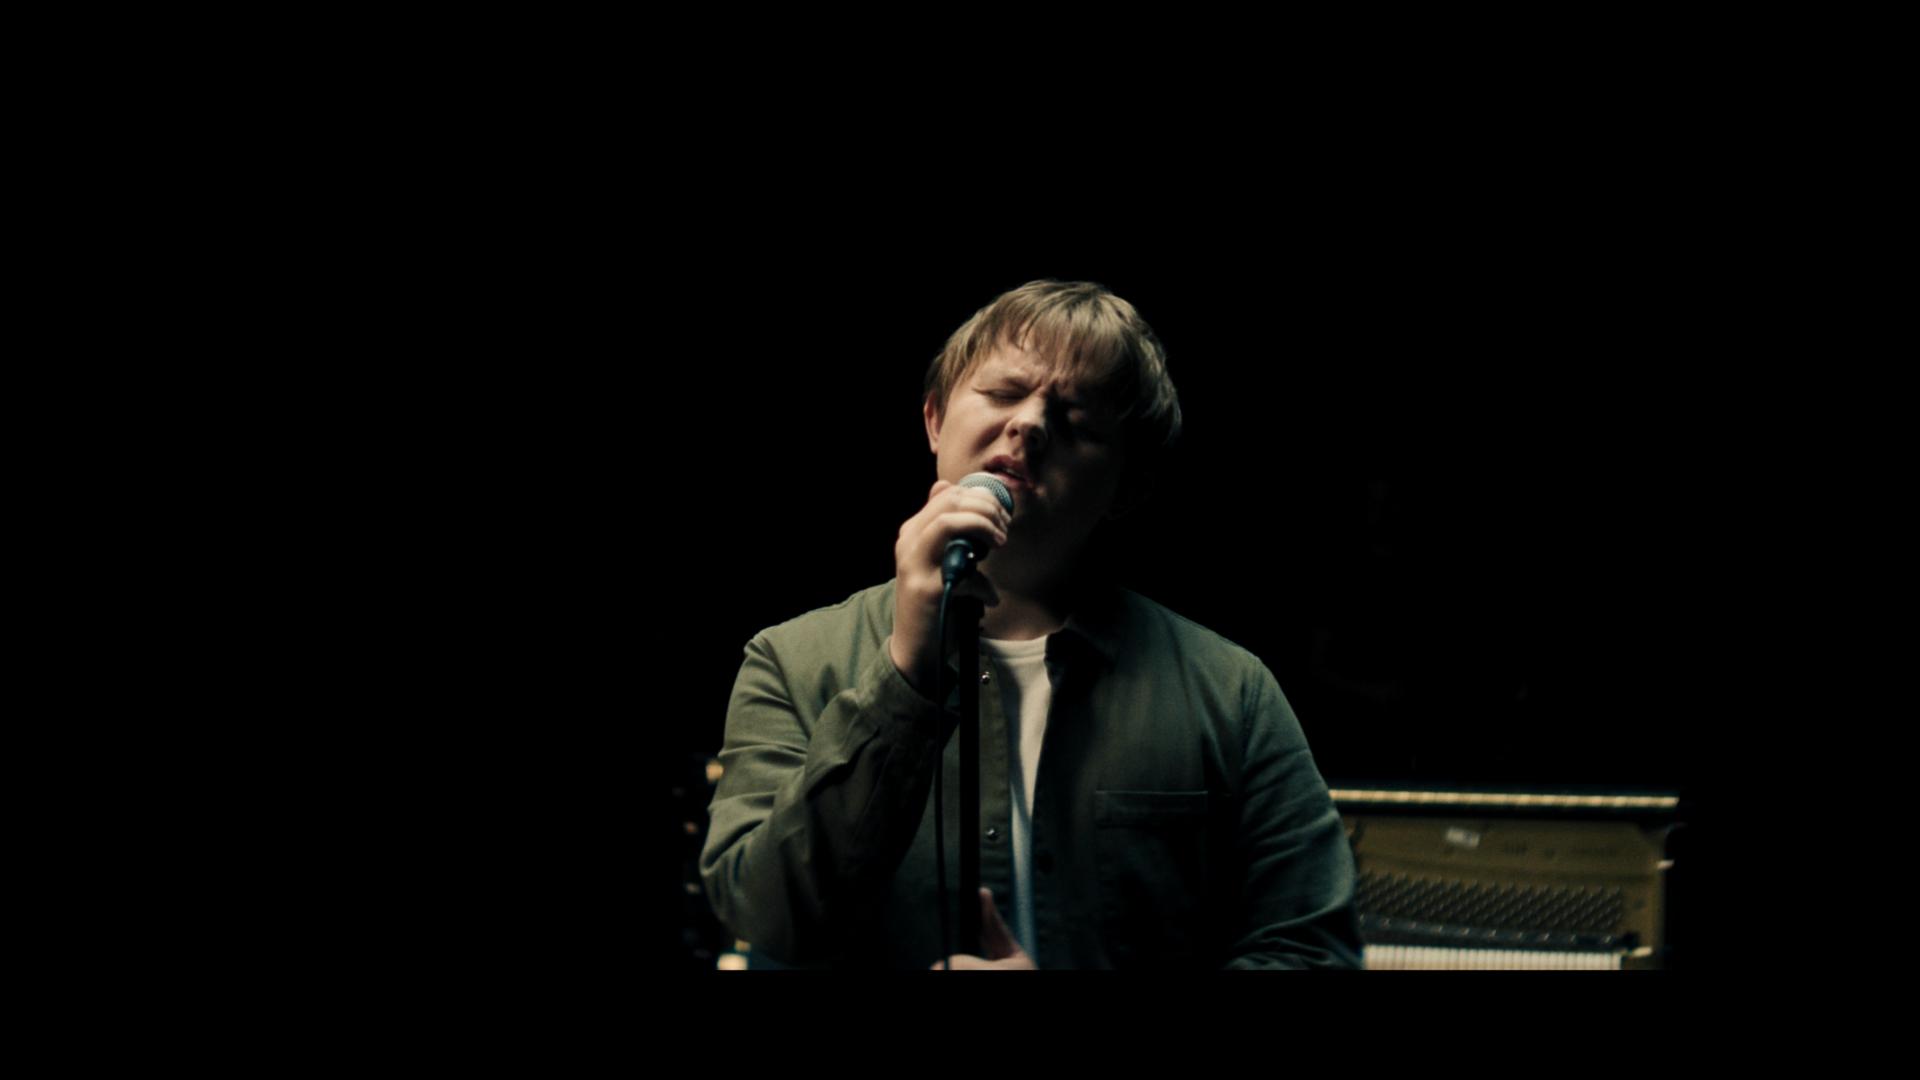 Live Music Video Videos Promonews